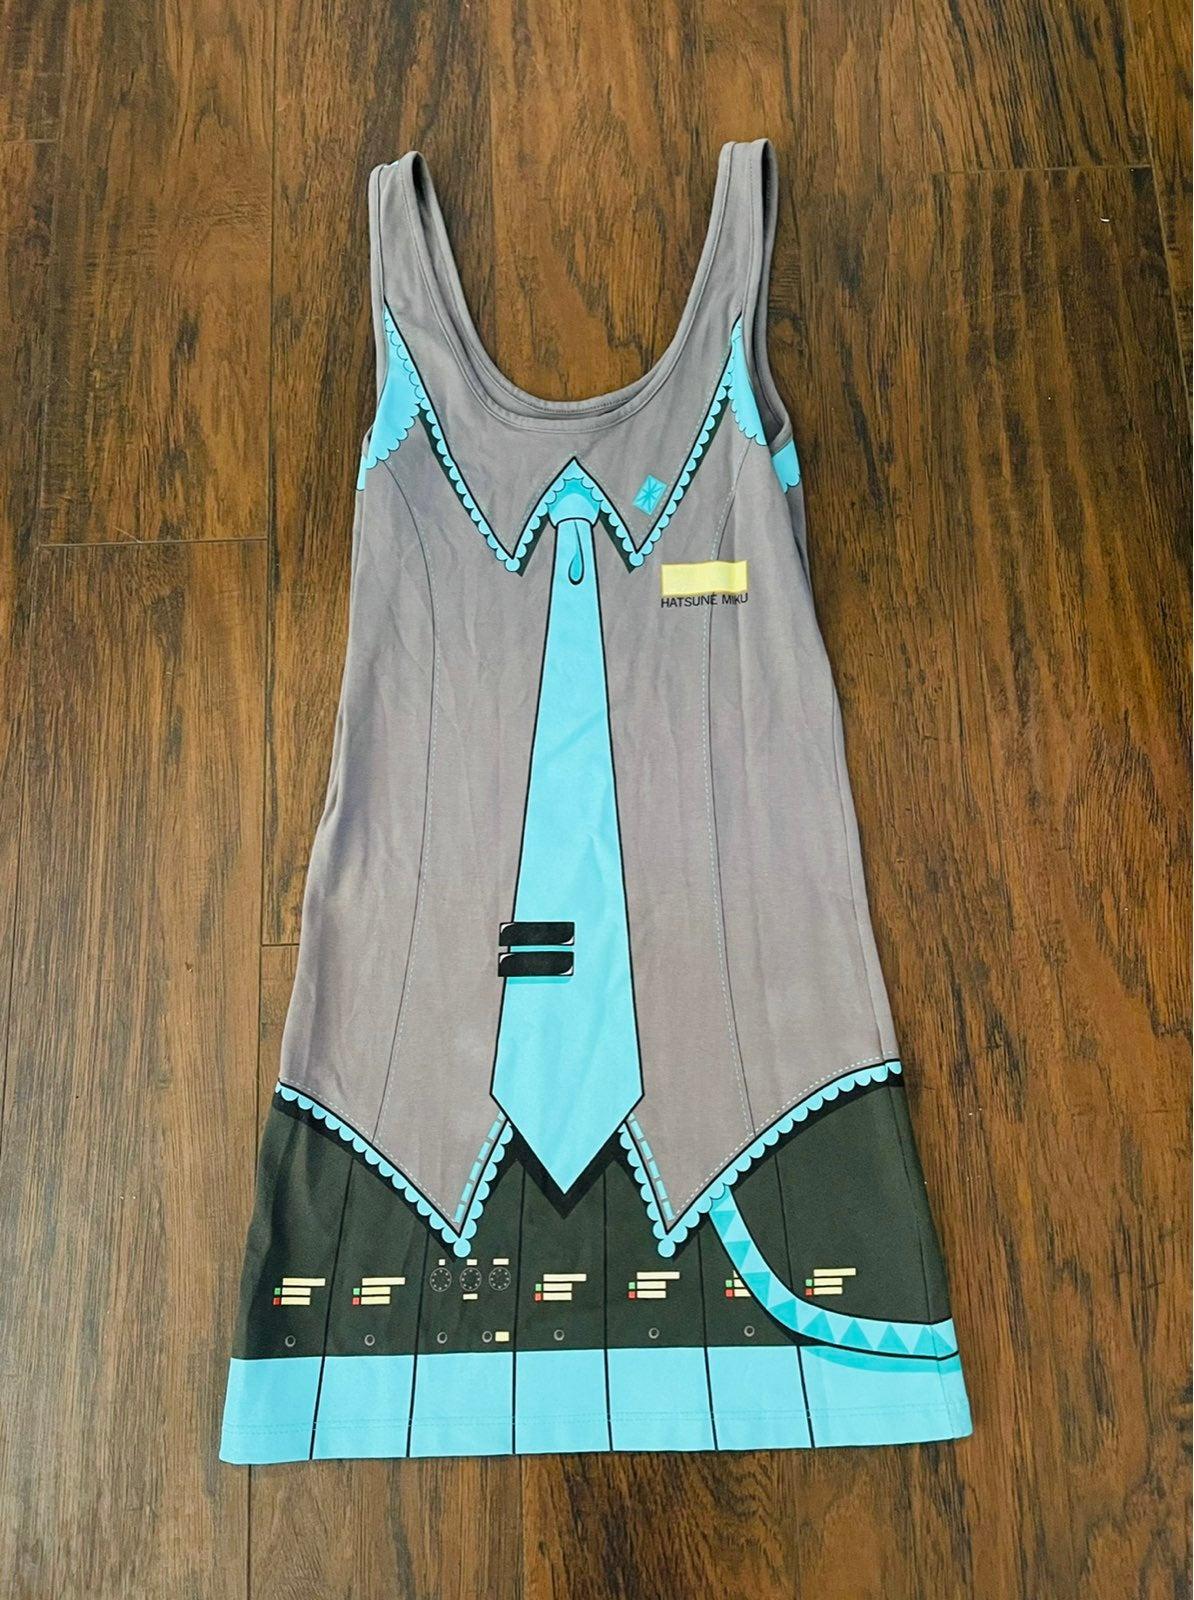 Hatsune Miku Dress